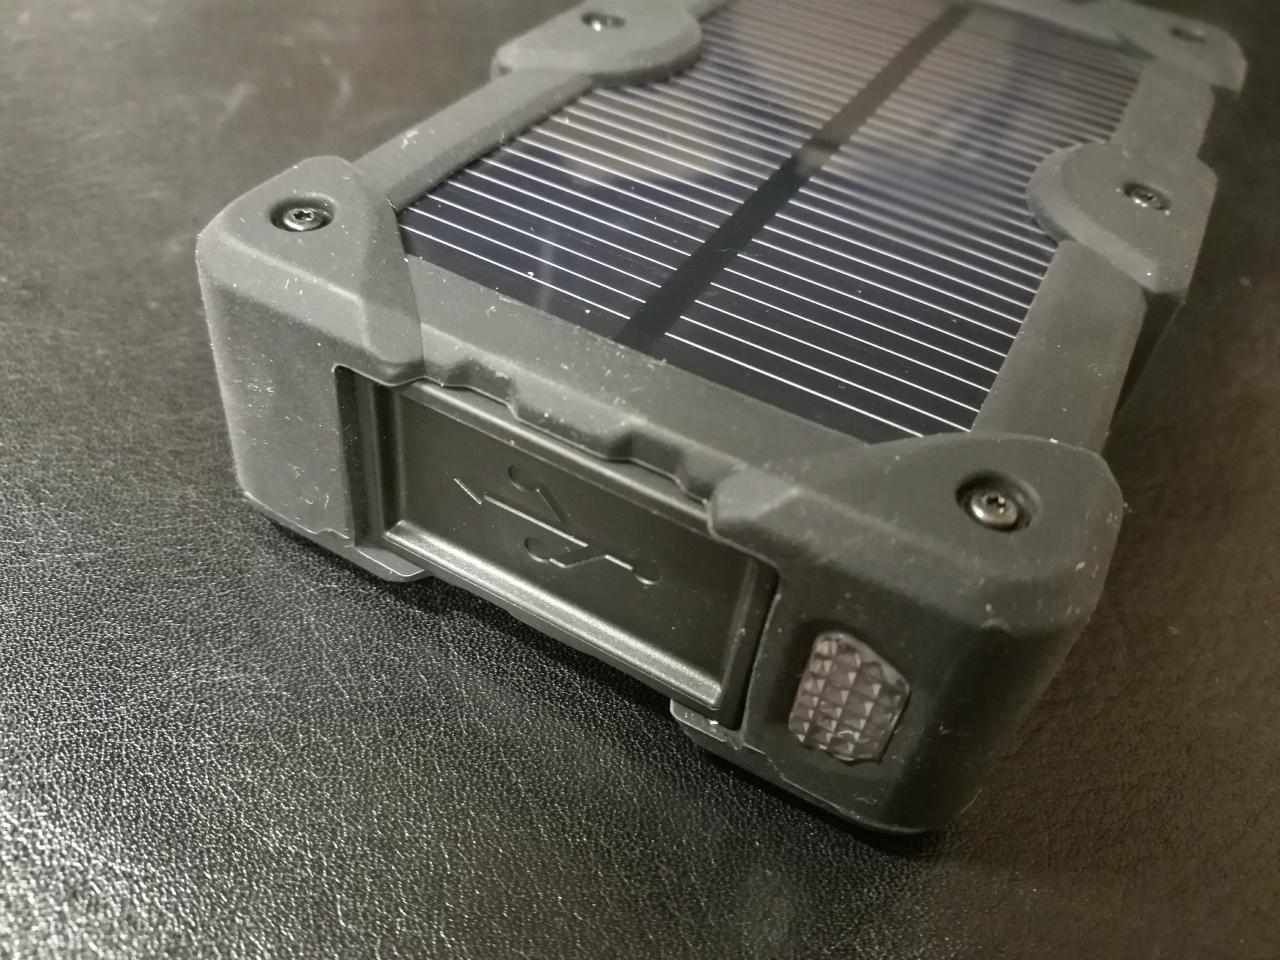 pr-ec-technology-solar-power-bank-04